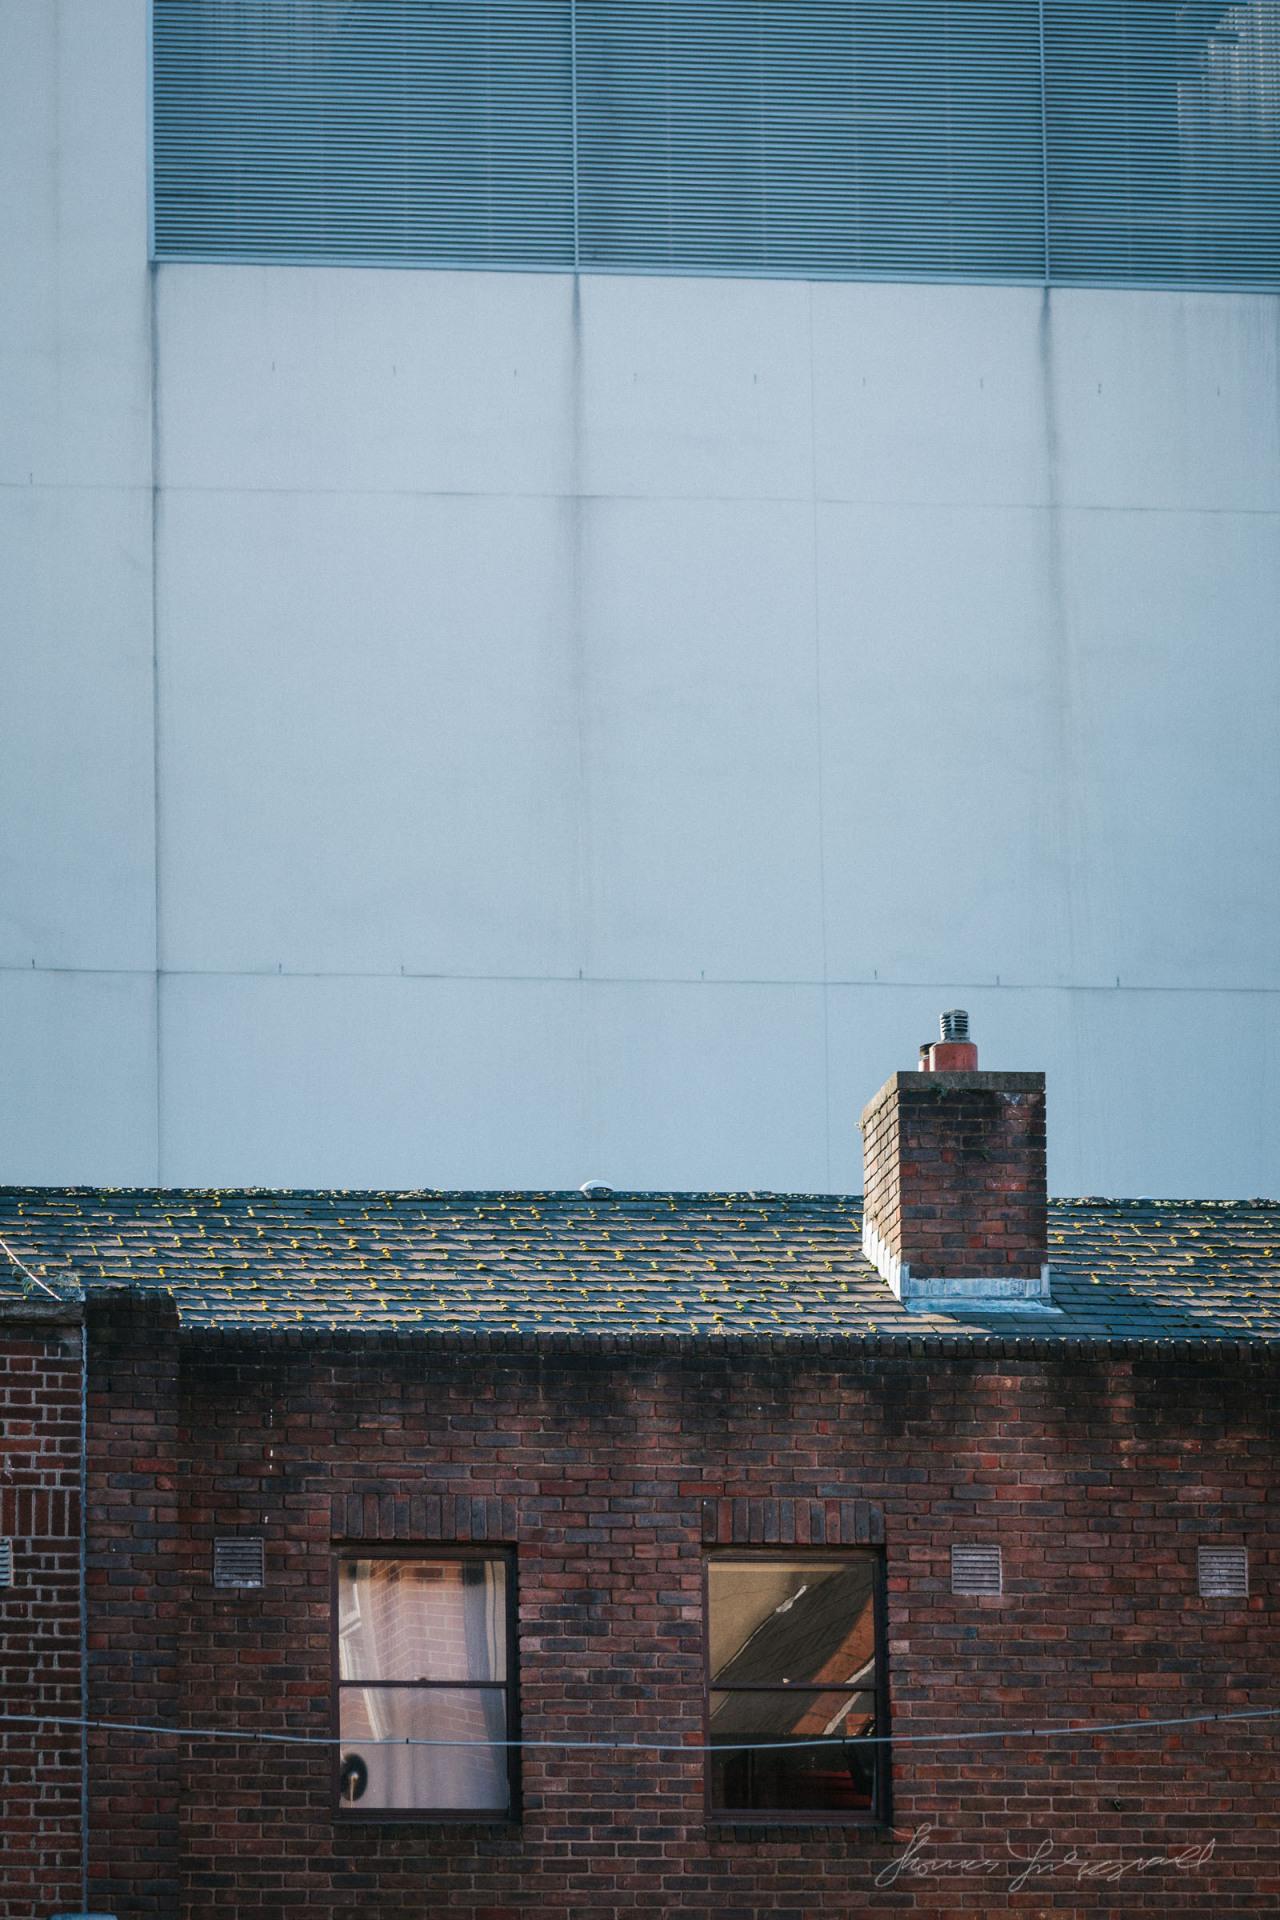 Dublin rooftop